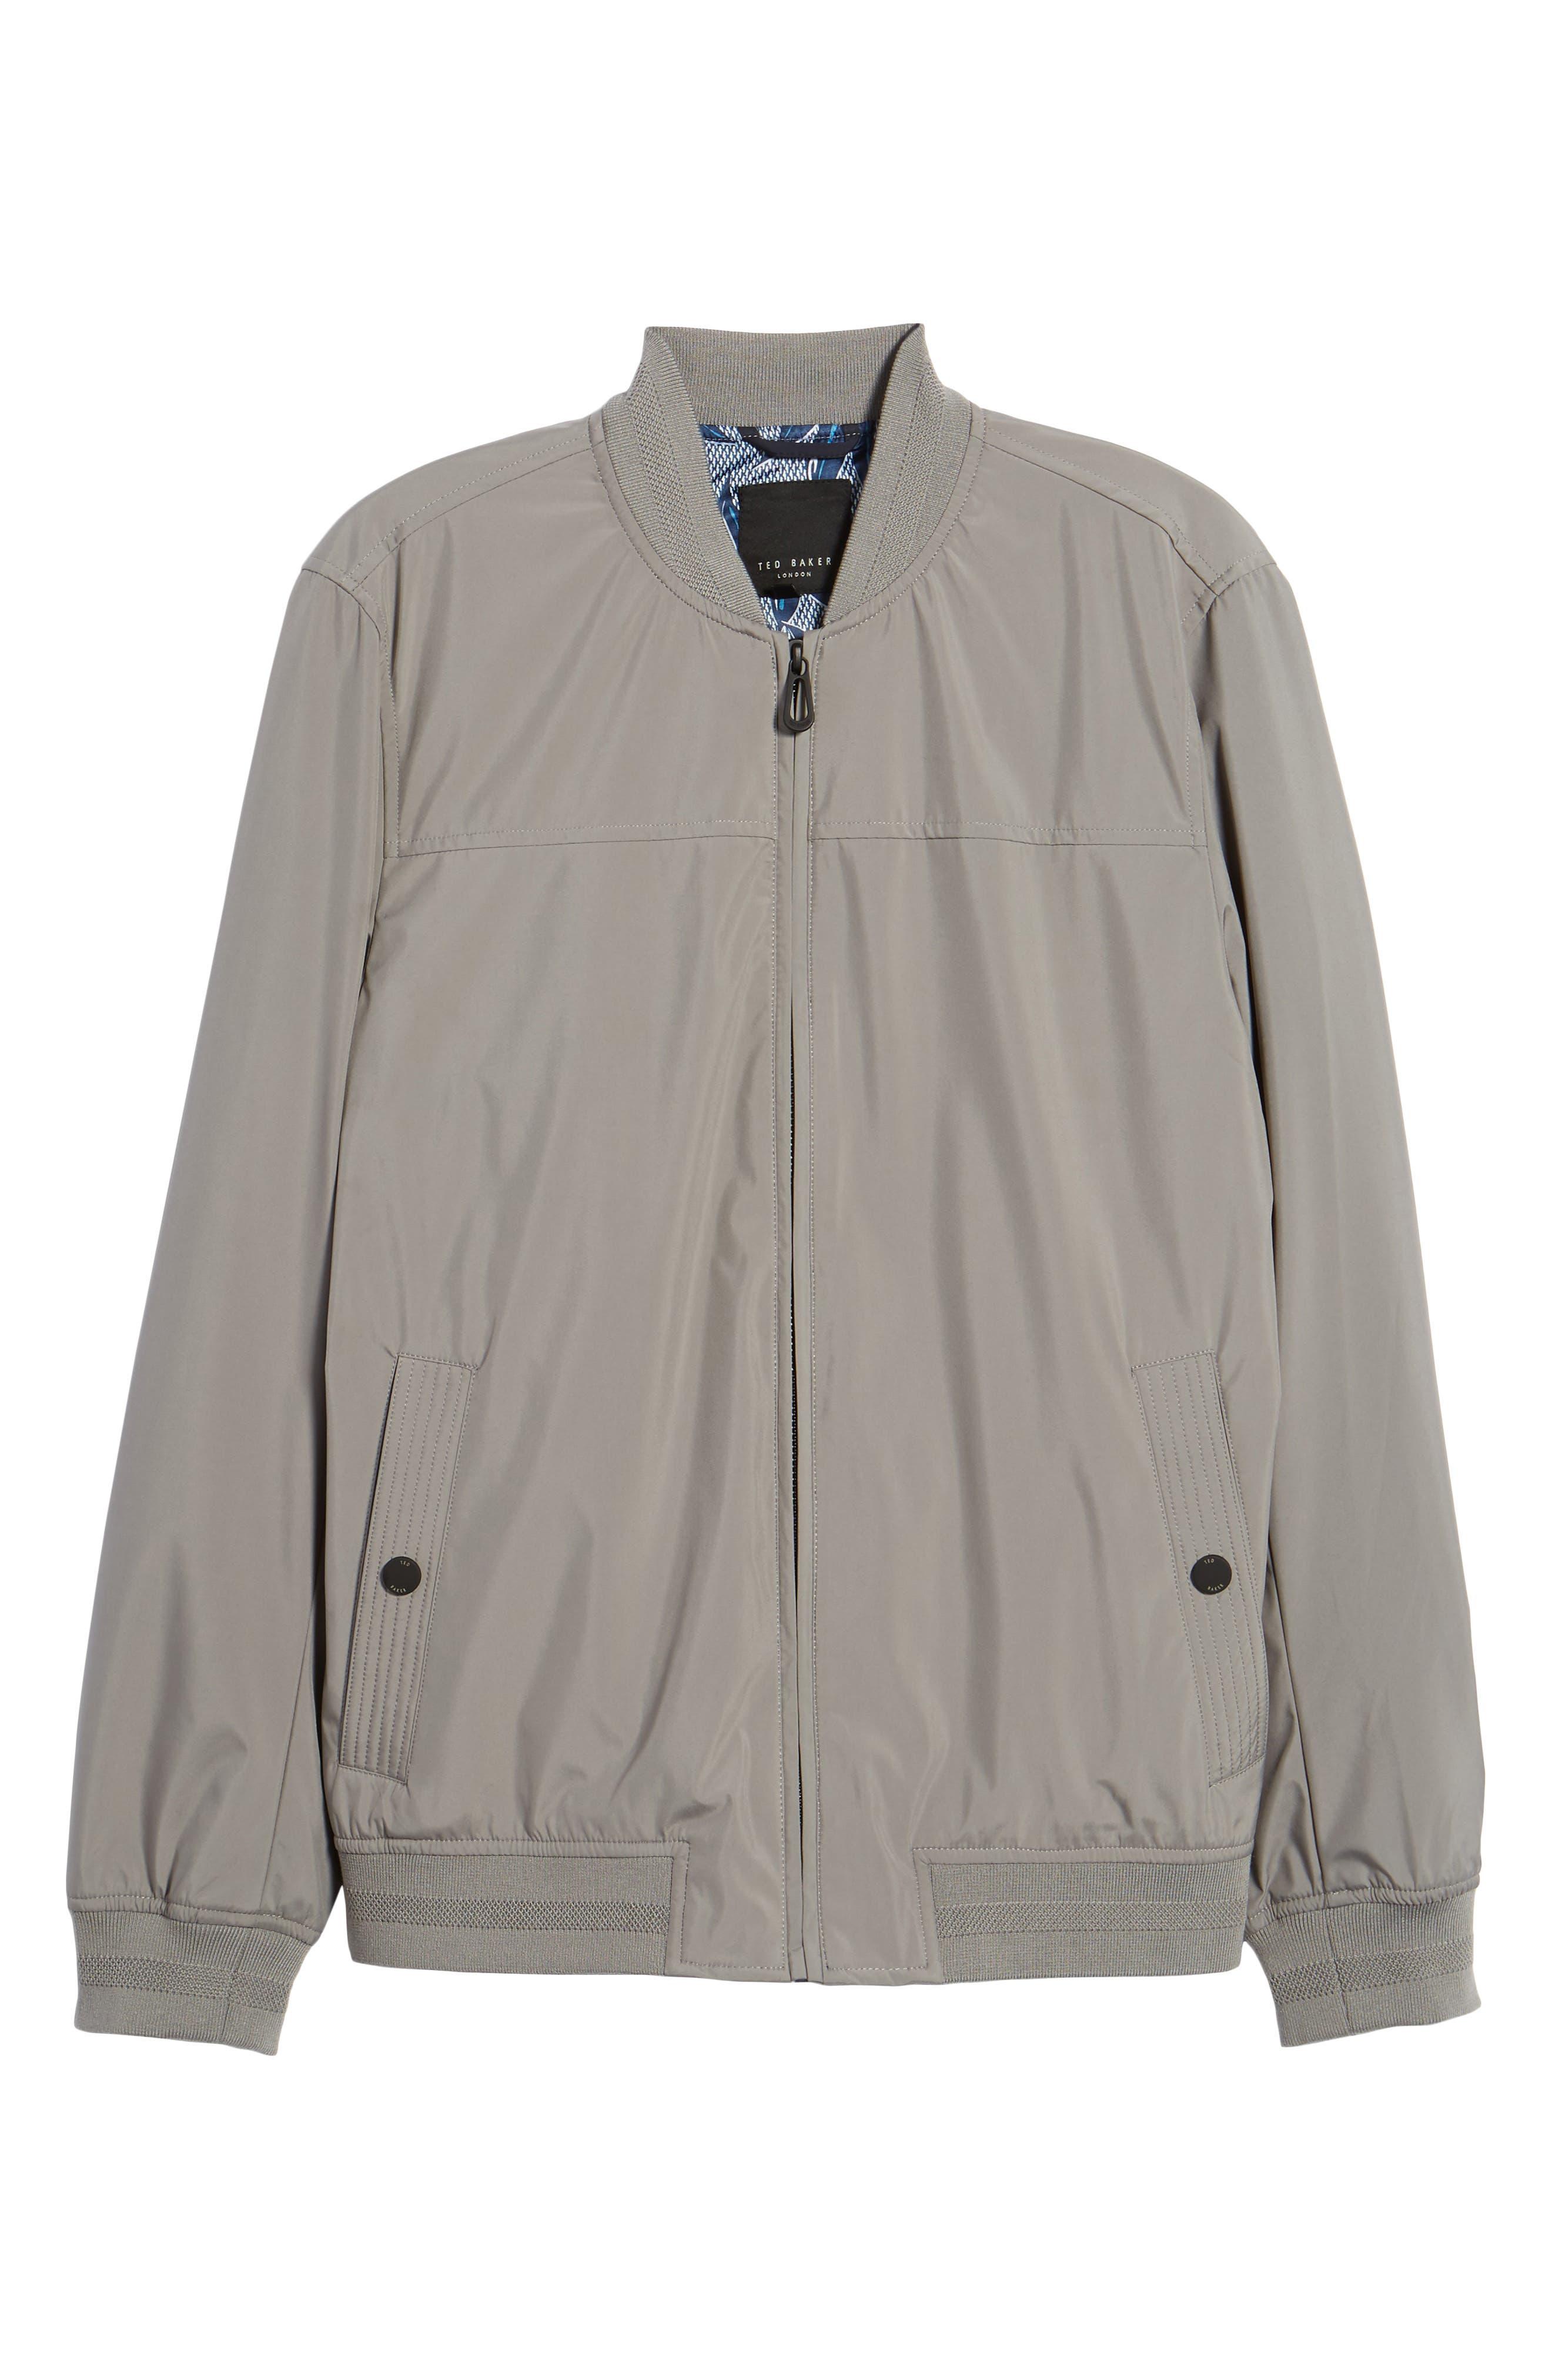 Ohtatt Bomber Jacket,                             Alternate thumbnail 6, color,                             Grey